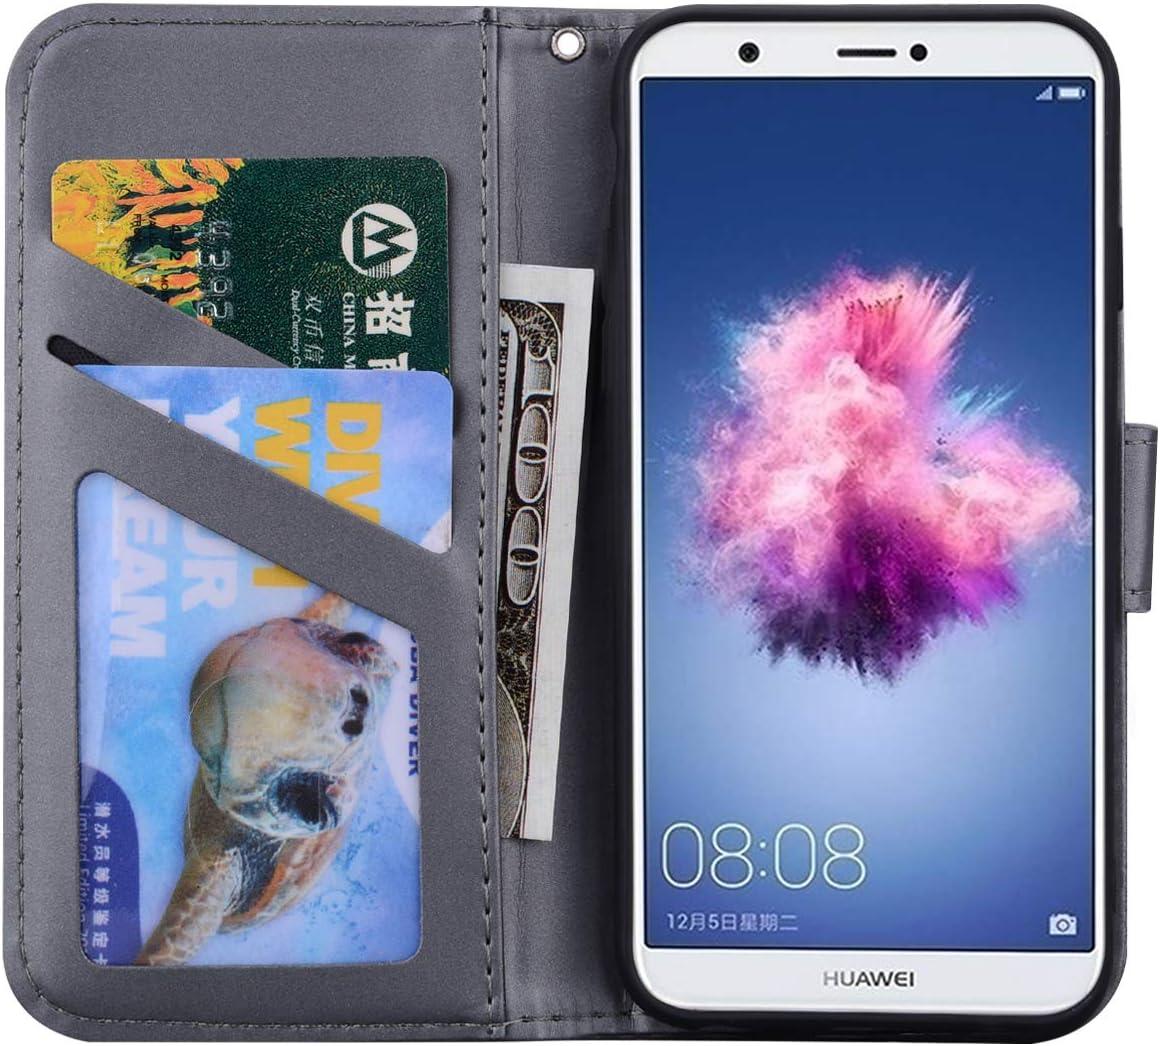 Lomogo Cover Huawei P Smart//Enjoy 7S Portafoglio Custodia a Libro Pelle Porta Carte Chiusura Magnetica Antiurto Flip Wallet Case per Huawei P Smart LOHME010303 Arancio